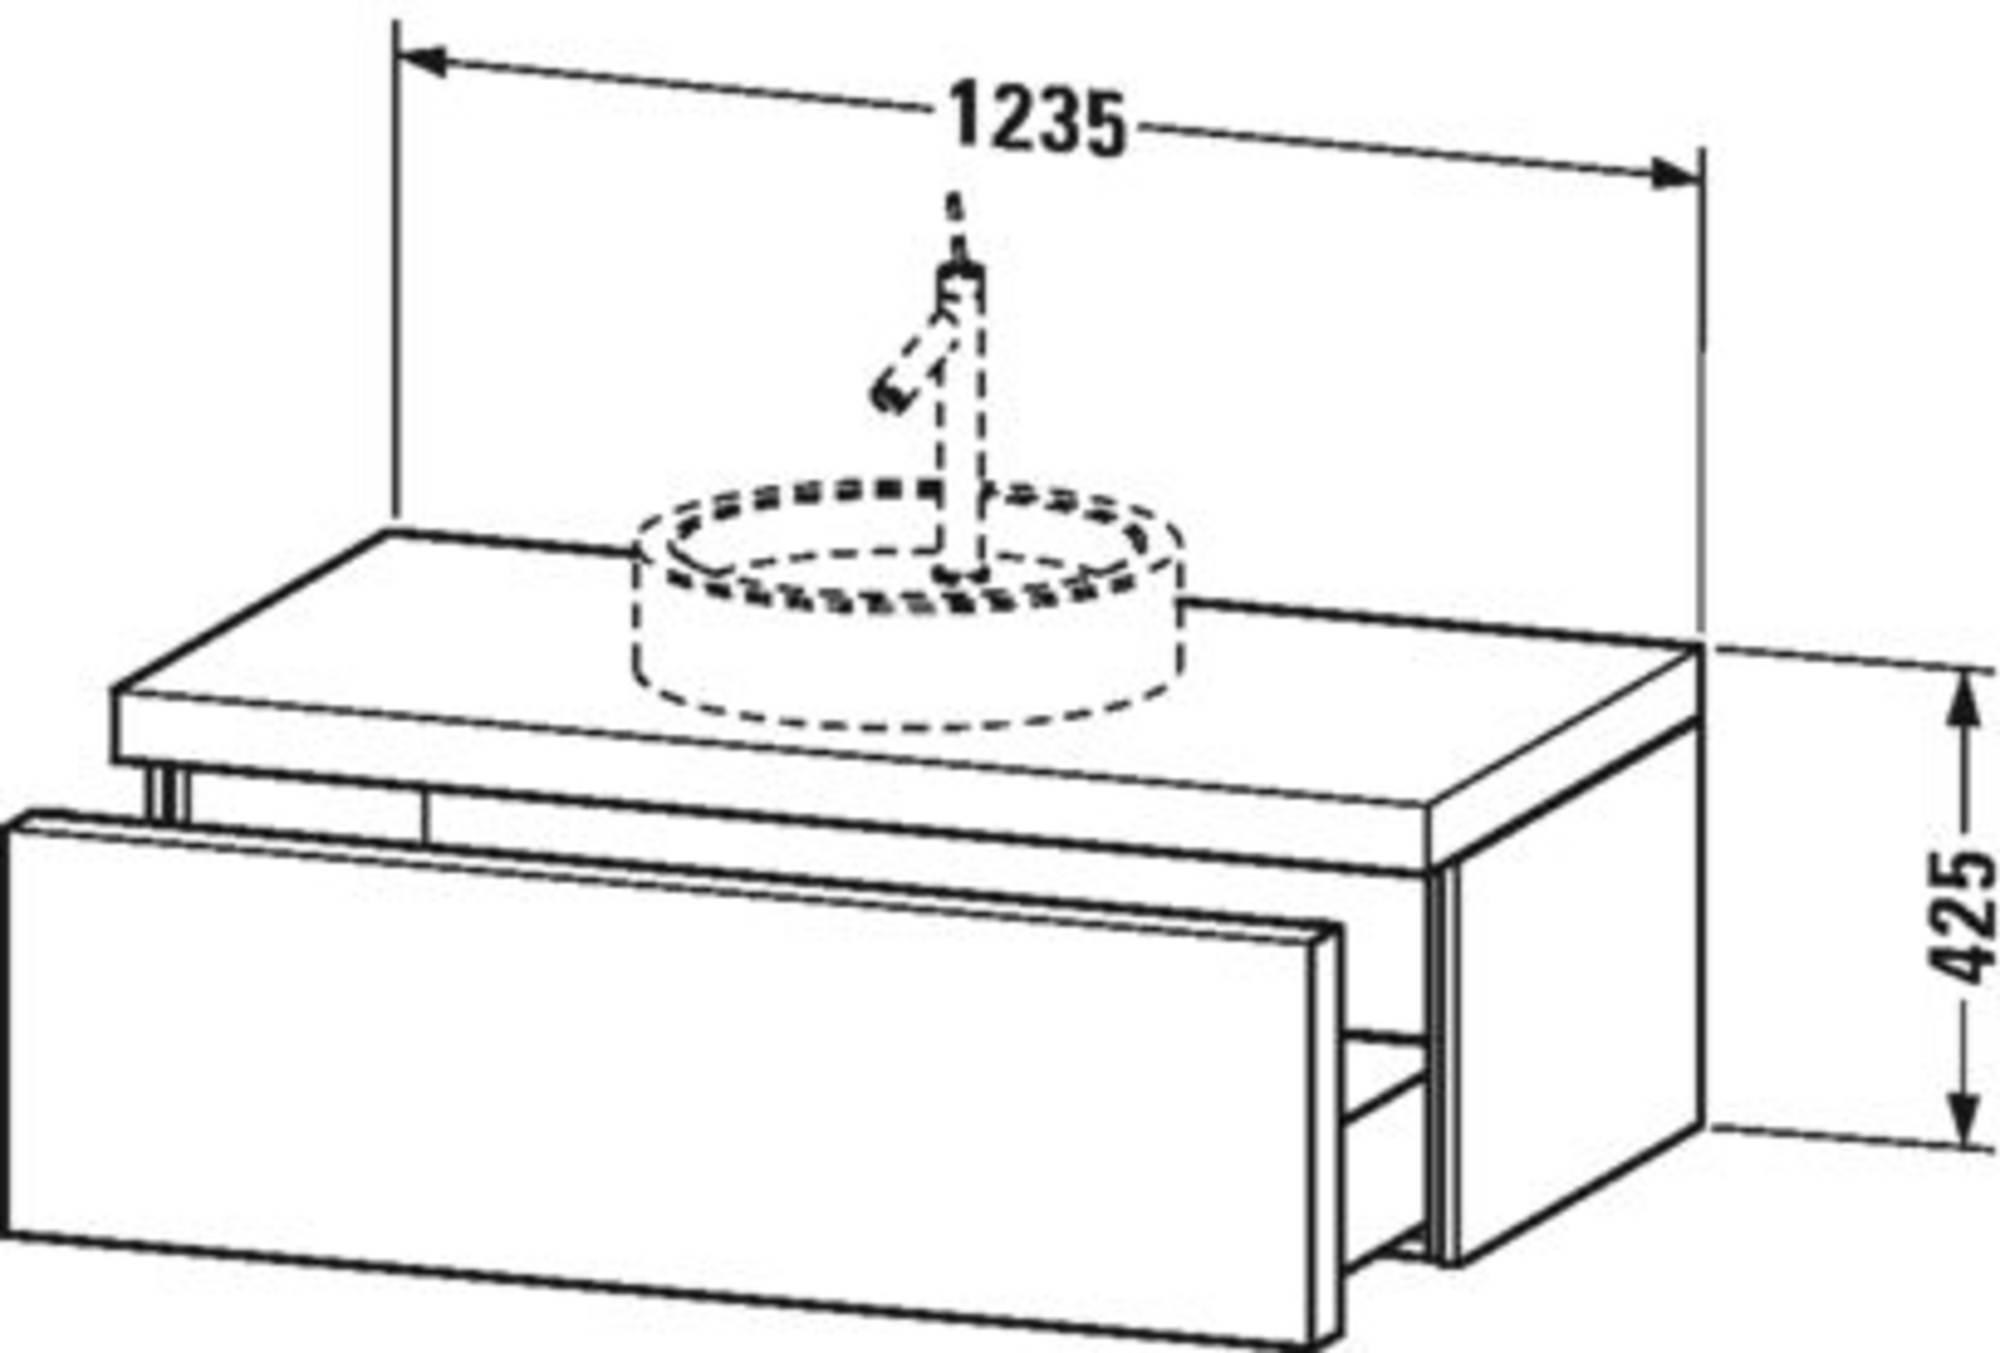 Duravit Starck 1 onderkast 1 lade 1 uitsparing rechts 123,5x56,5x42,5 cm Zwart Hoogglans